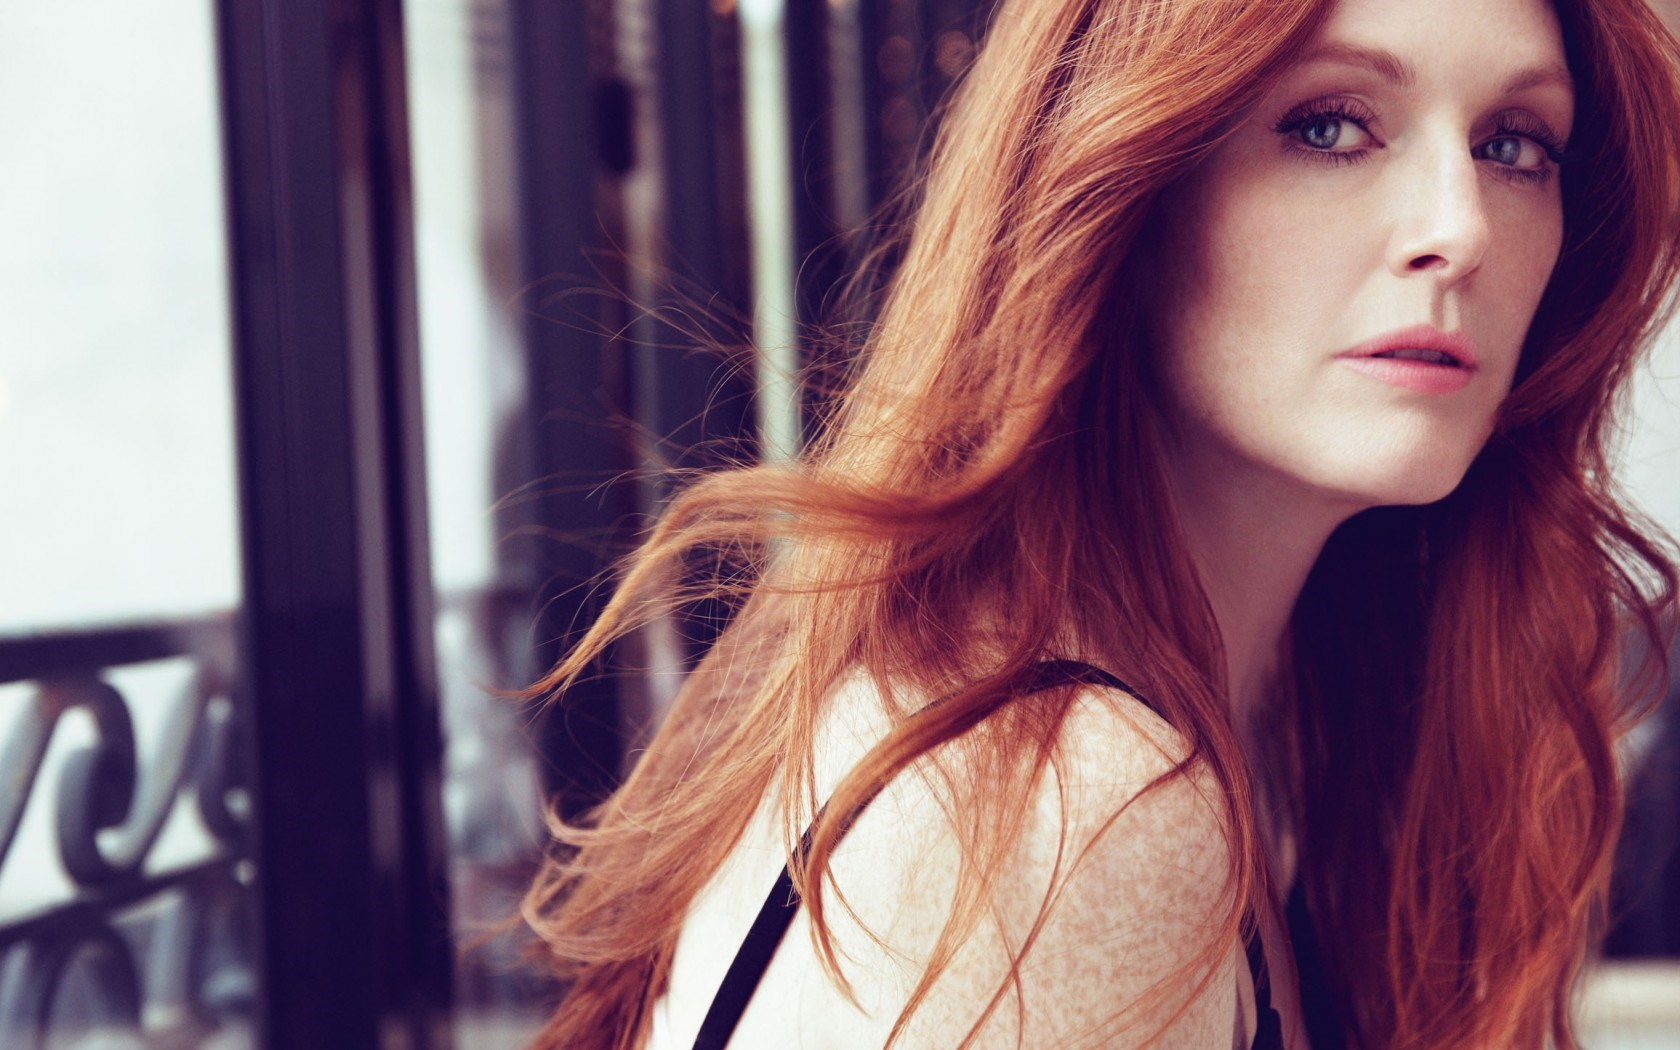 Actress Girl Redhead Julianne Moore